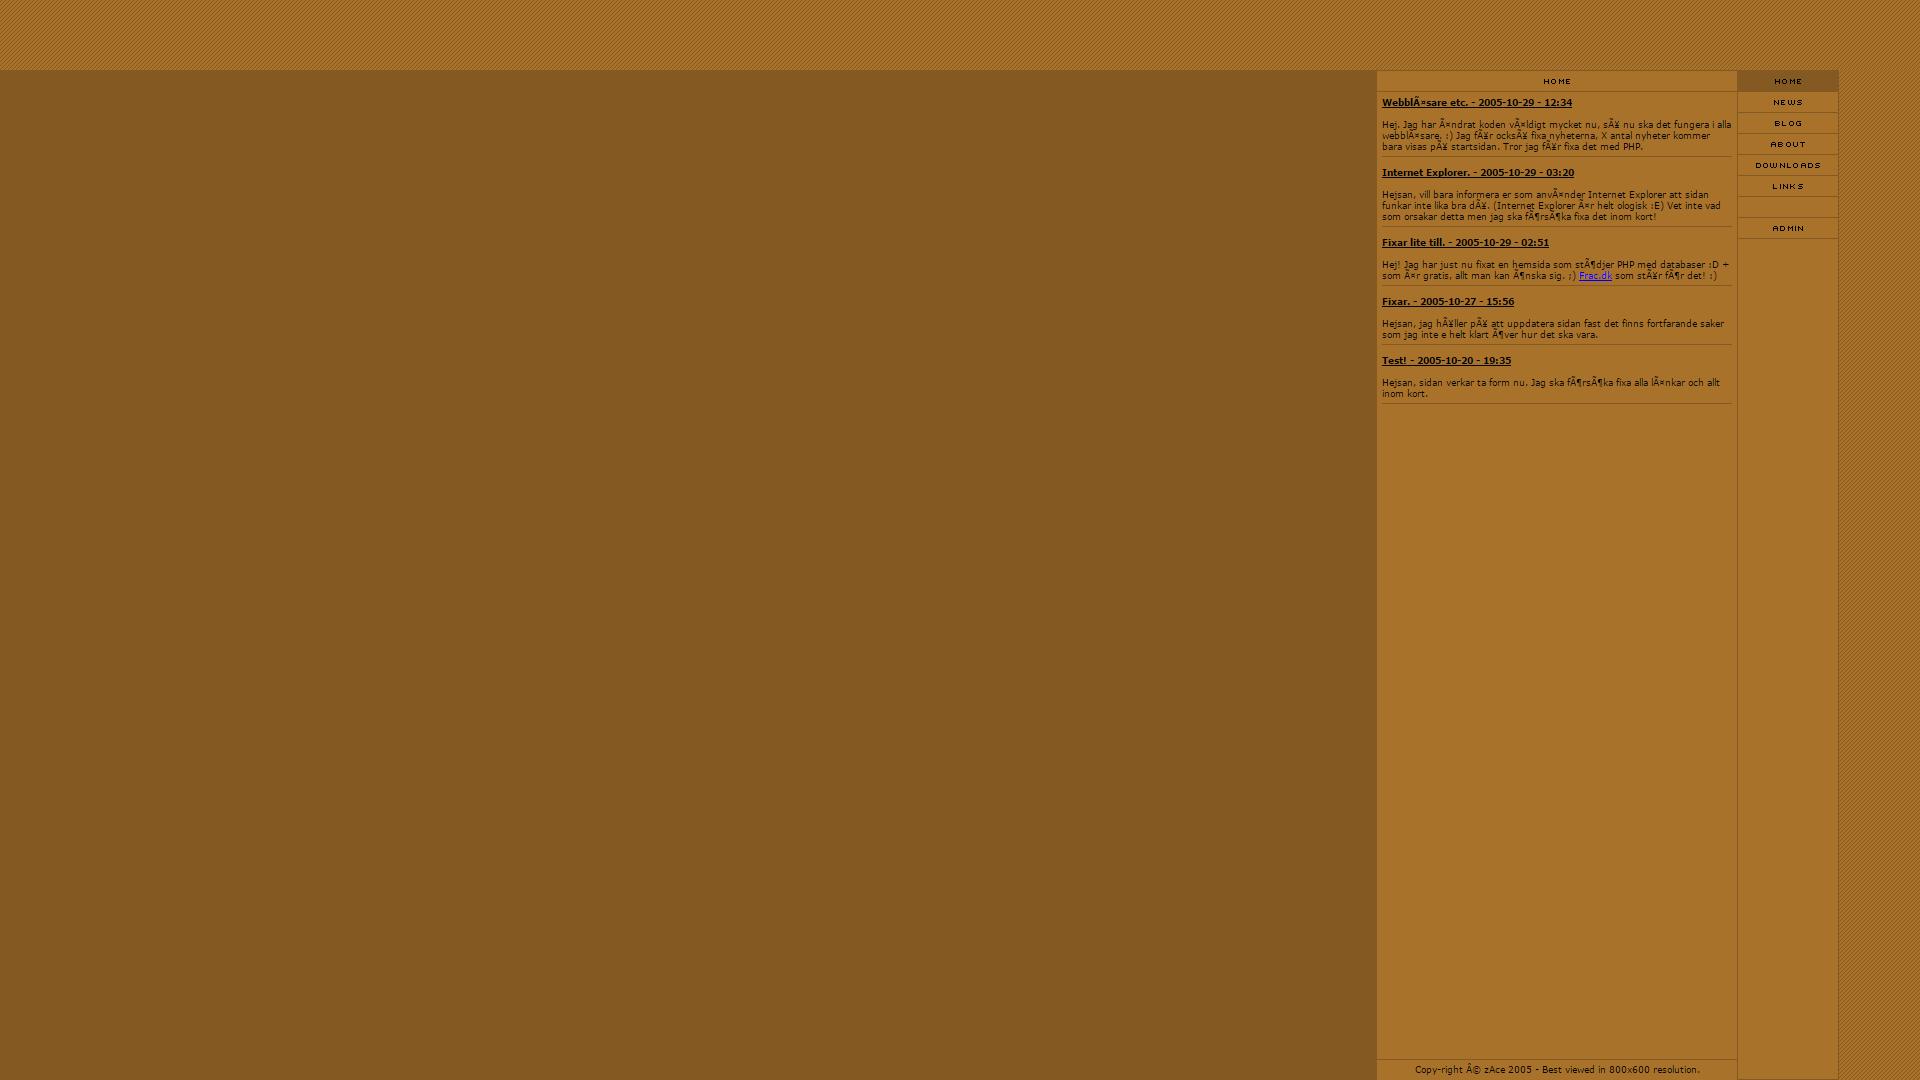 rusty-steel/assets/images/screenshot.png